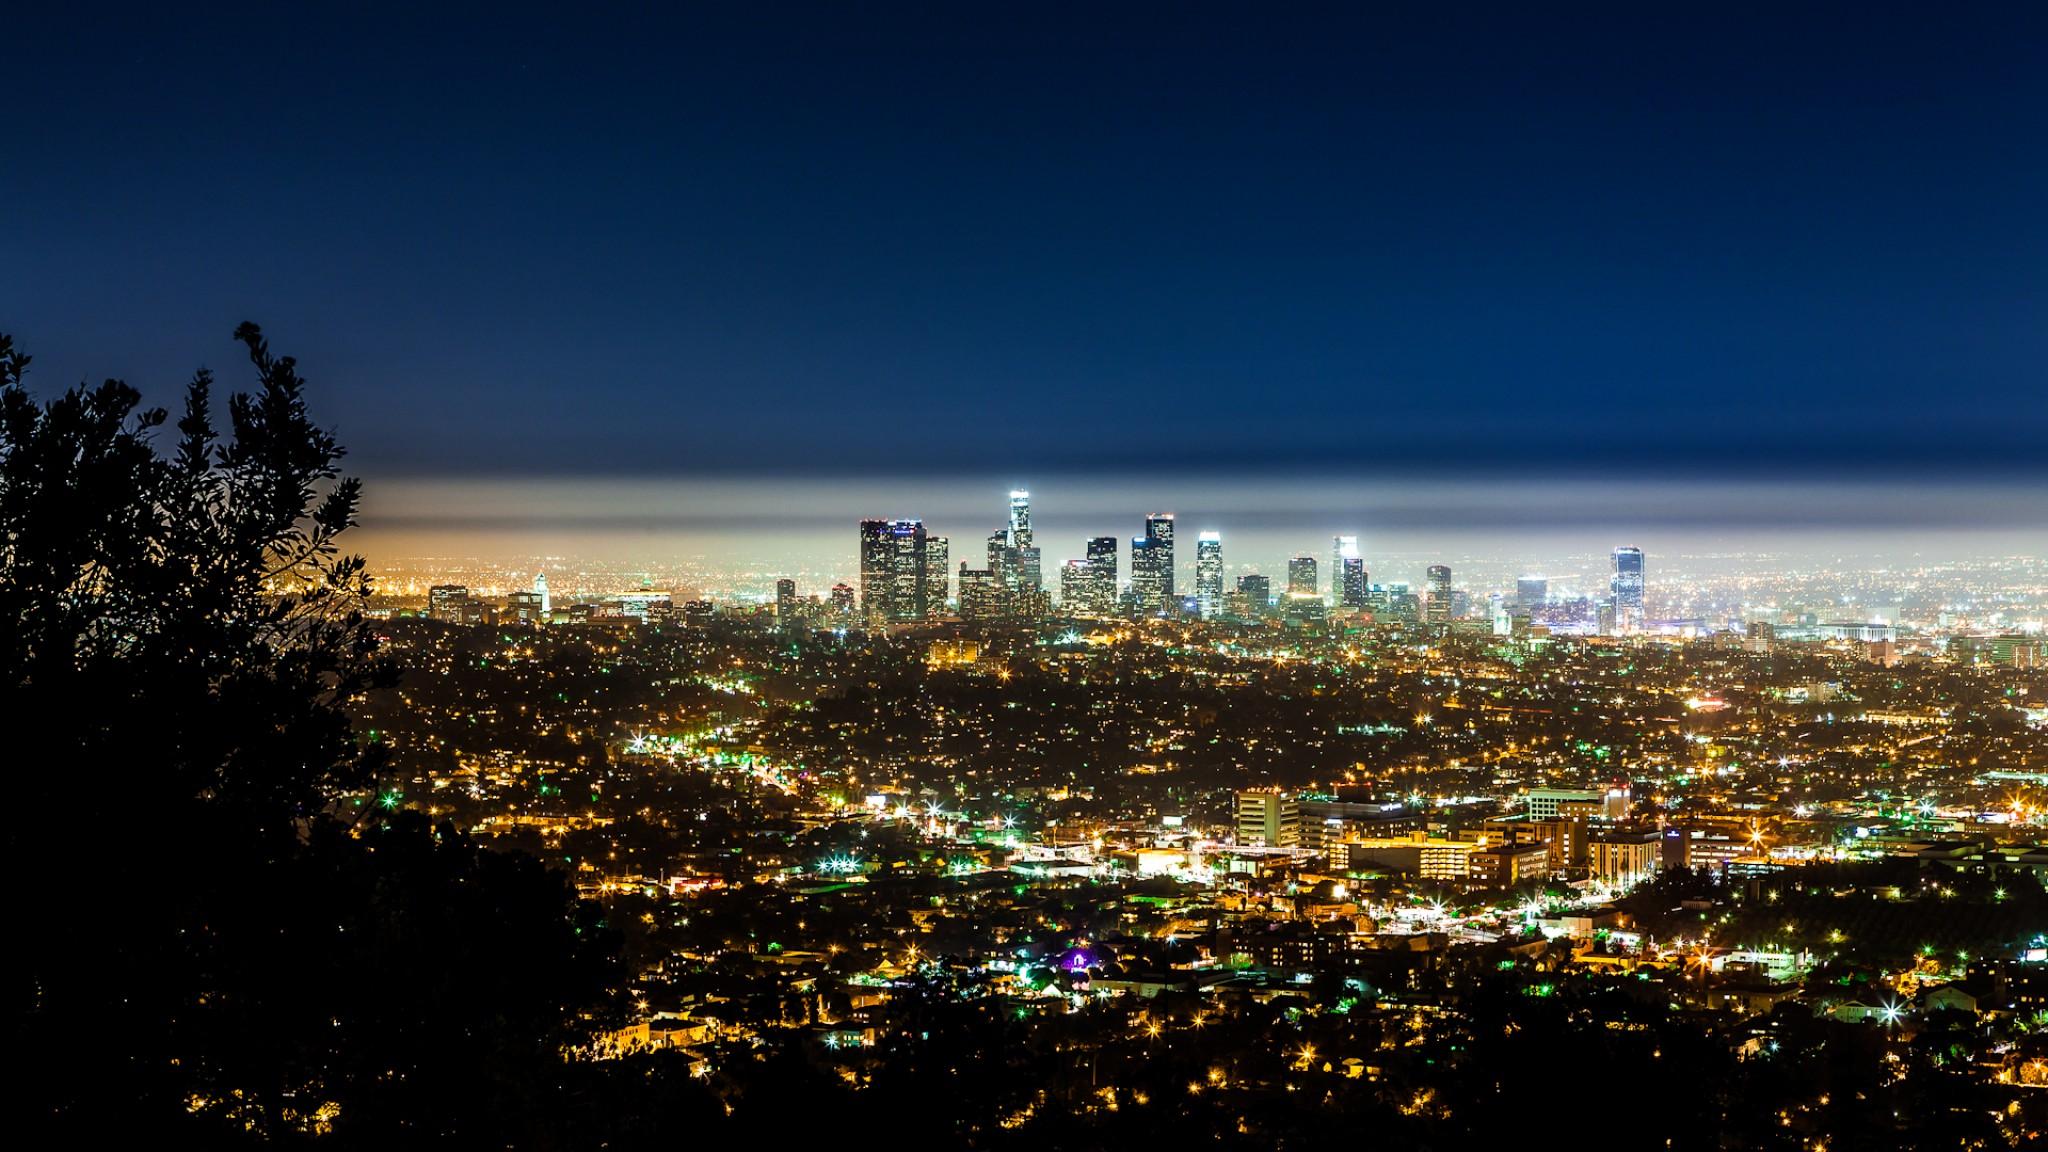 USA  California  Los Angeles  City   Nature   Cities  HD Wallpaper